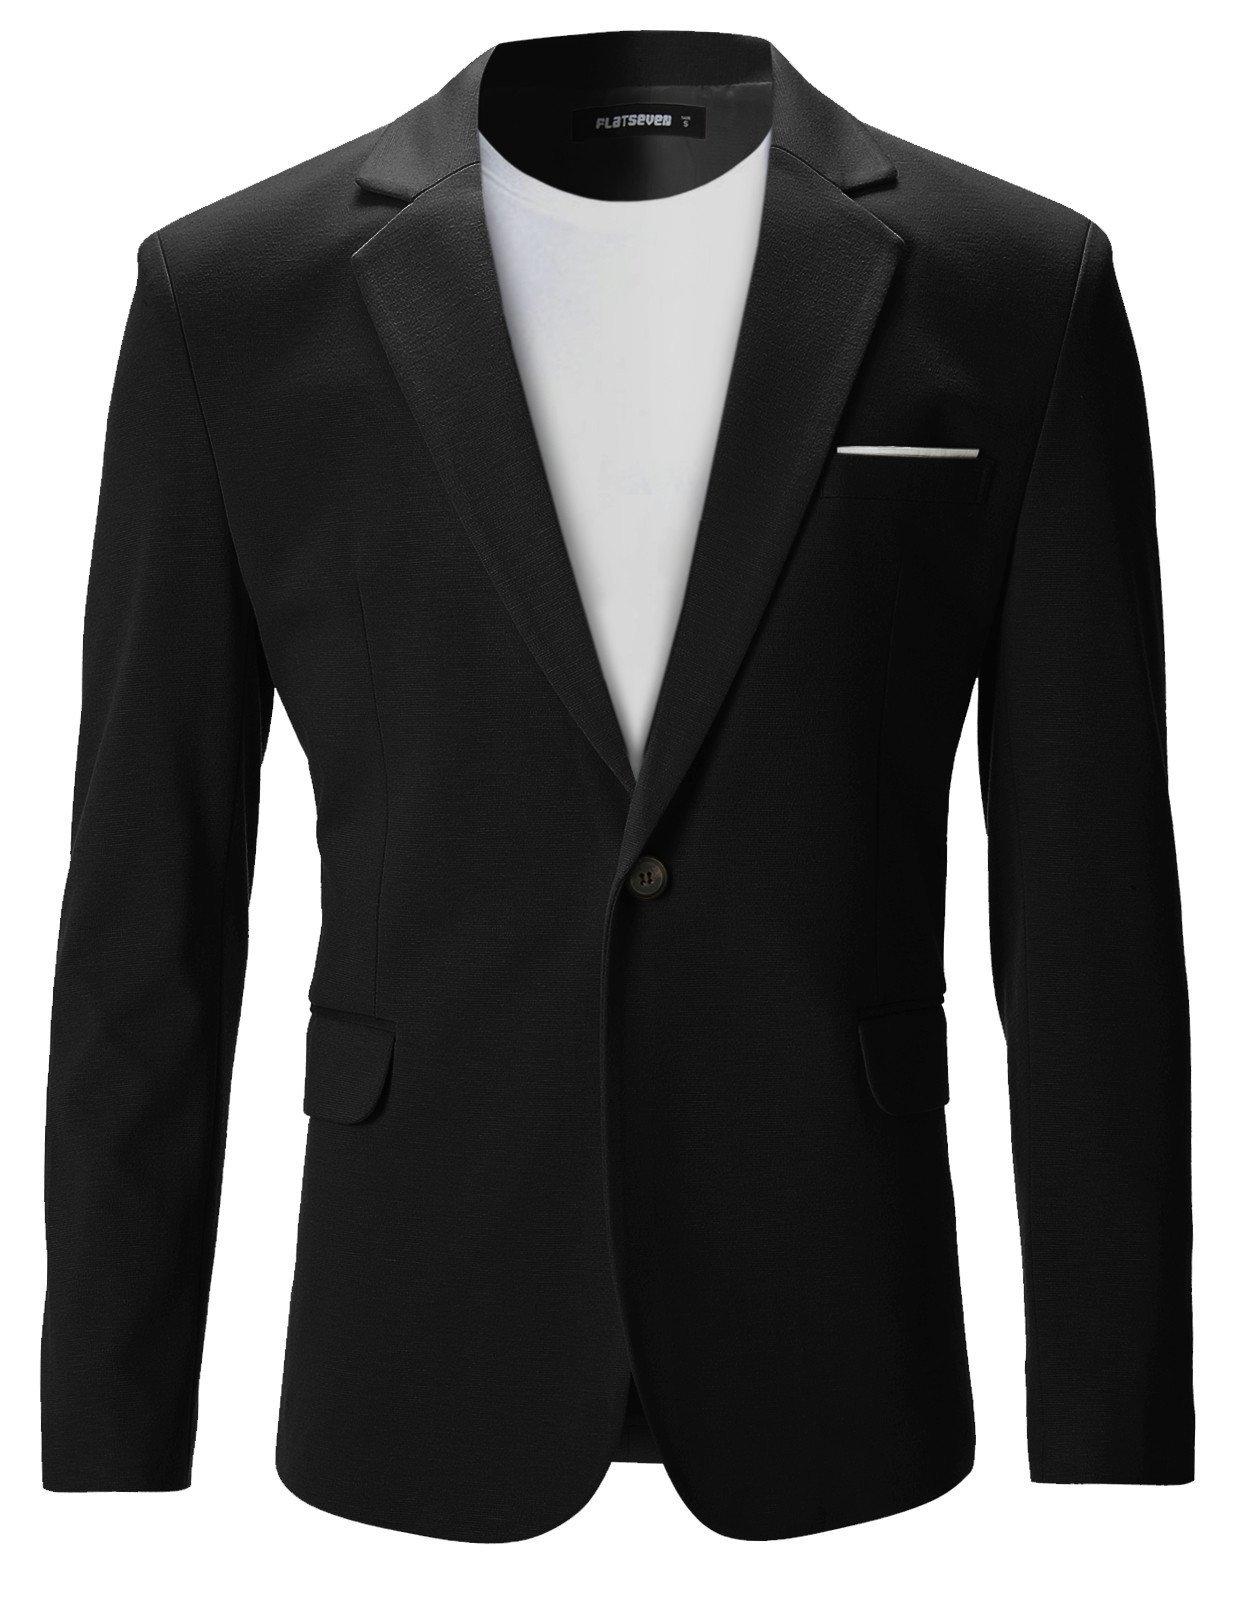 FLATSEVEN Mens Slim Fit Casual Premium Blazer Jacket (BJ102) Black, XXL